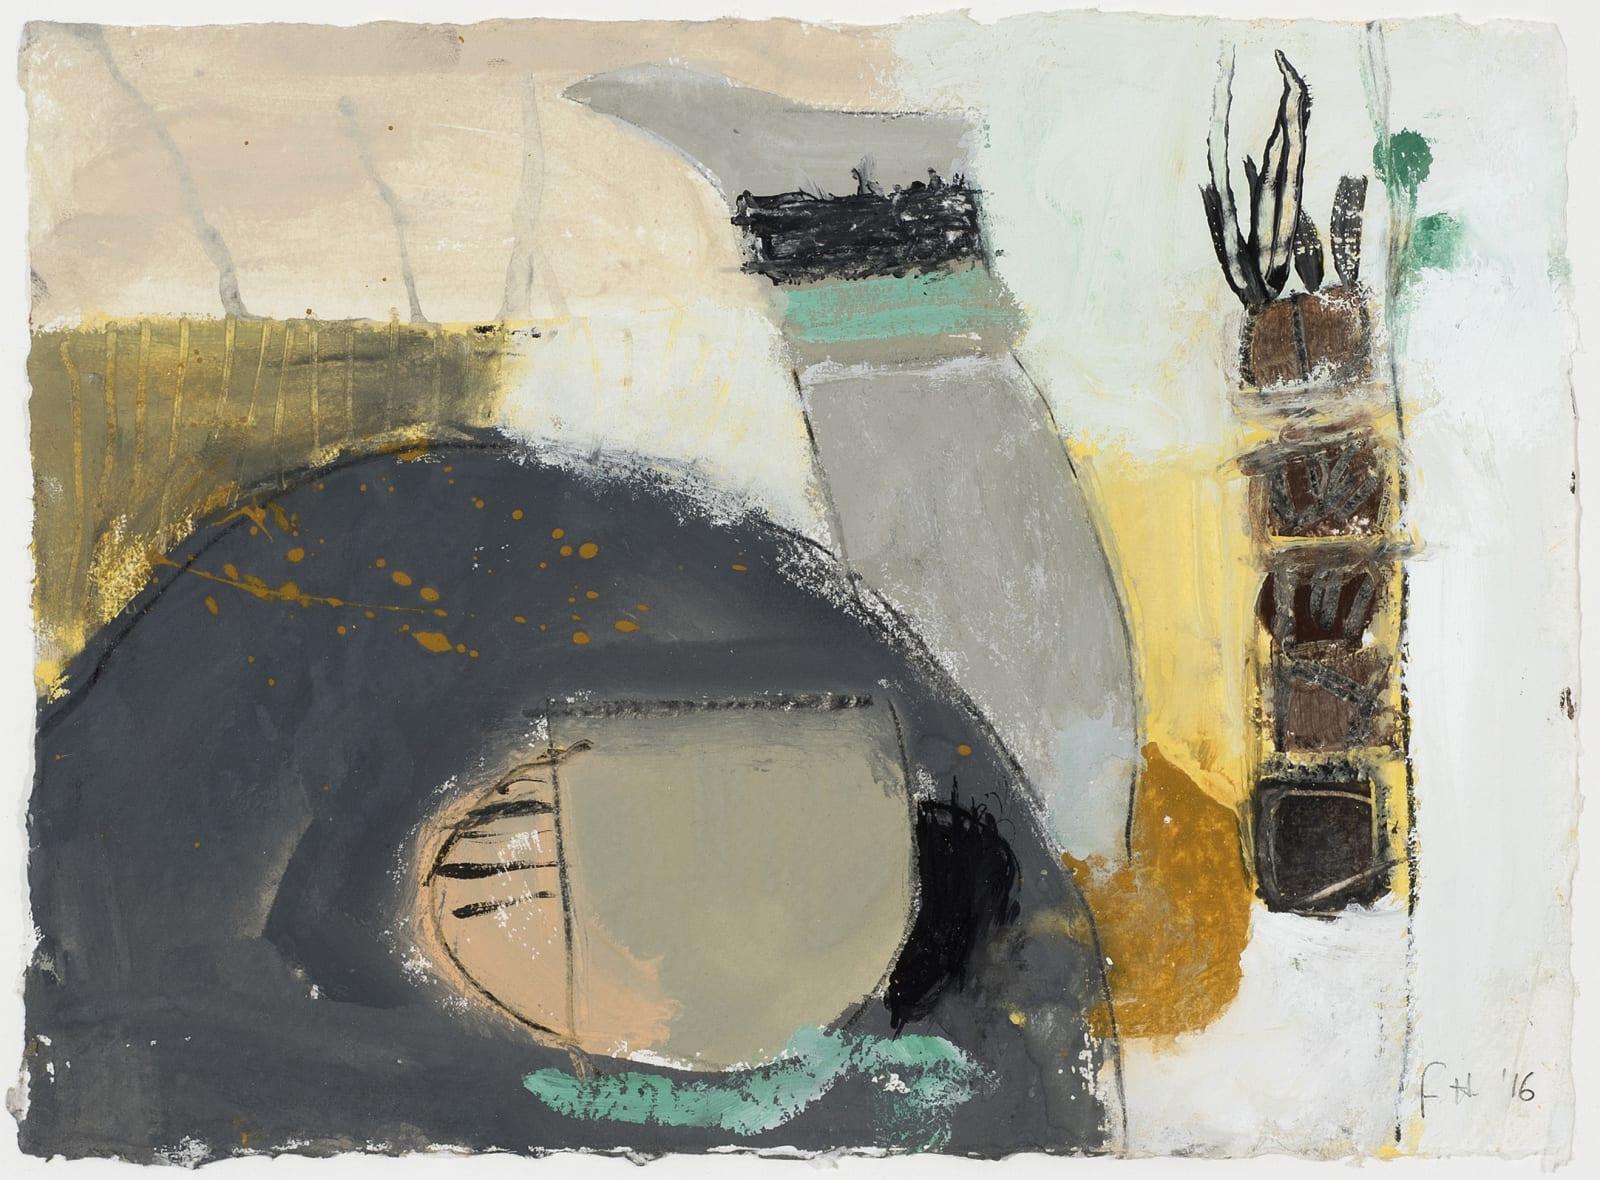 Felice Hodges, Fifties Picnic